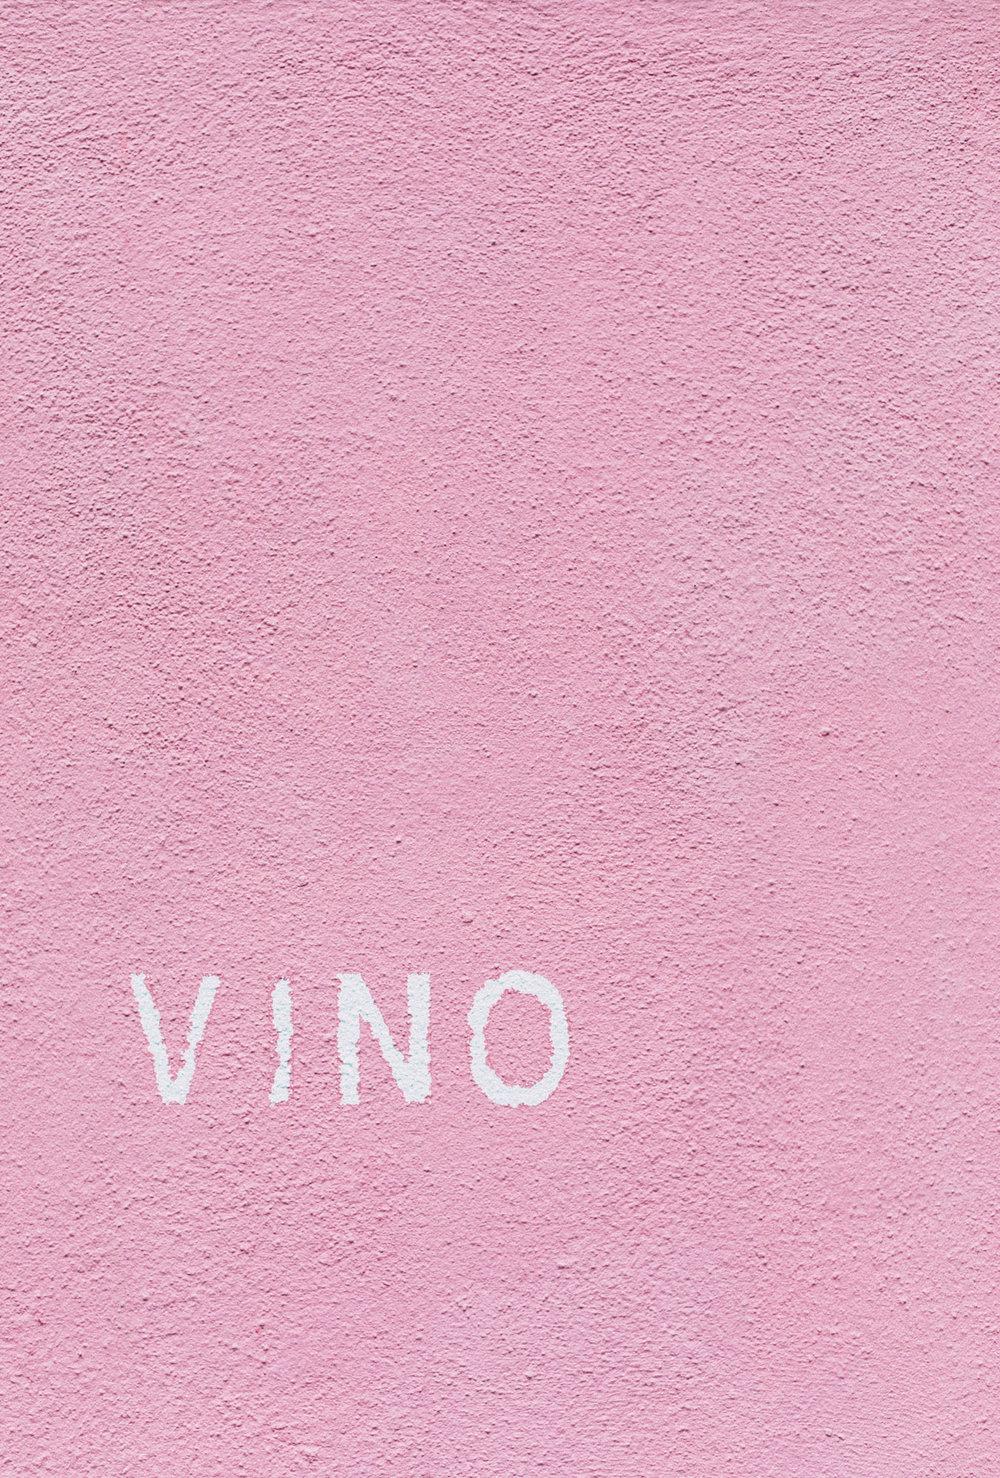 Honeymoon in Europe // Travel Ideas / Wanderlust / Photography / Europe Trip Itinerary / Vino / Wine Pink Quote